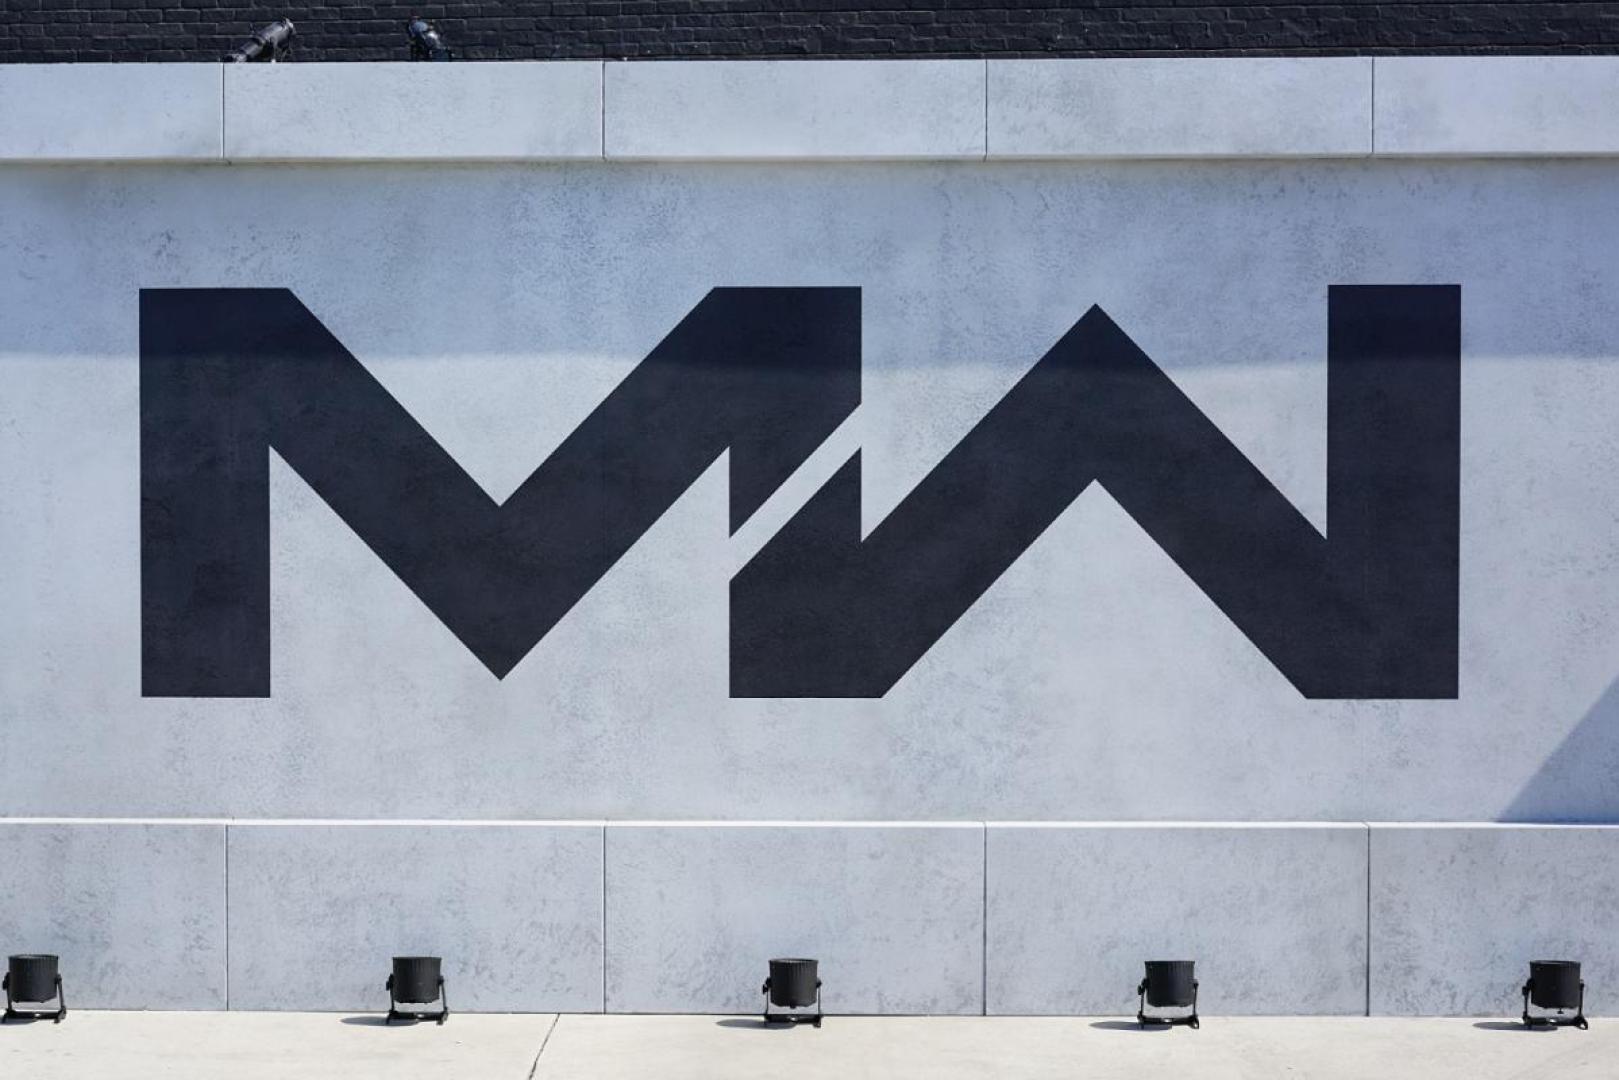 CoD:MW:最大64人プレイにクロスプレイオープンベータ開催など、固定観念を破壊する「再創造版」モダン・ウォーウェアマルチプレイ先行体験会リポート